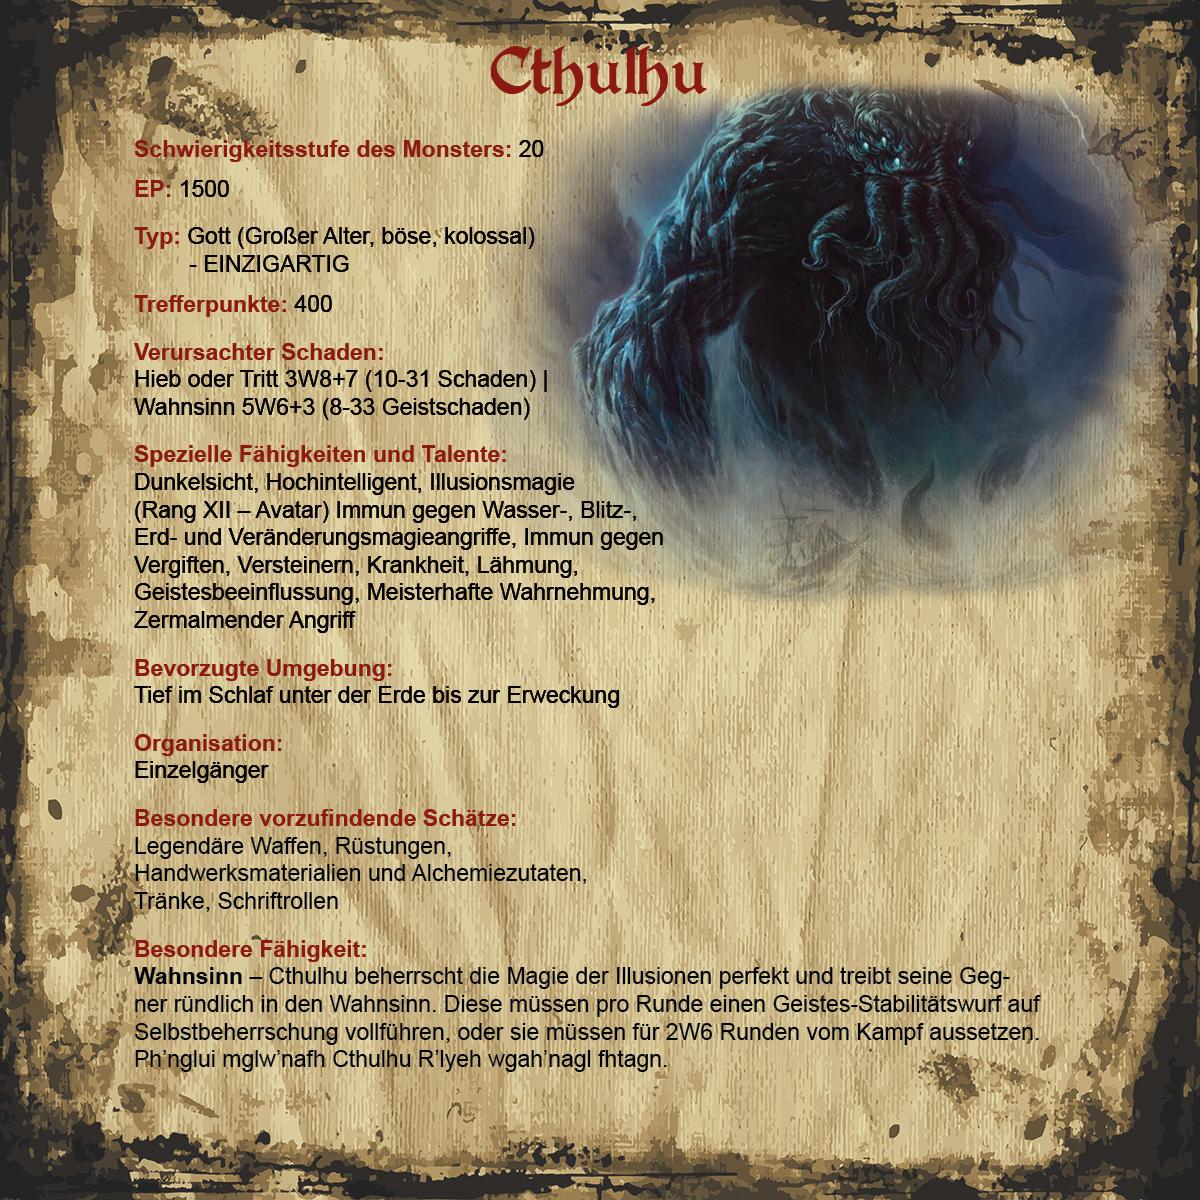 Cthulhu | Revaria Wiki | FANDOM powered by Wikia